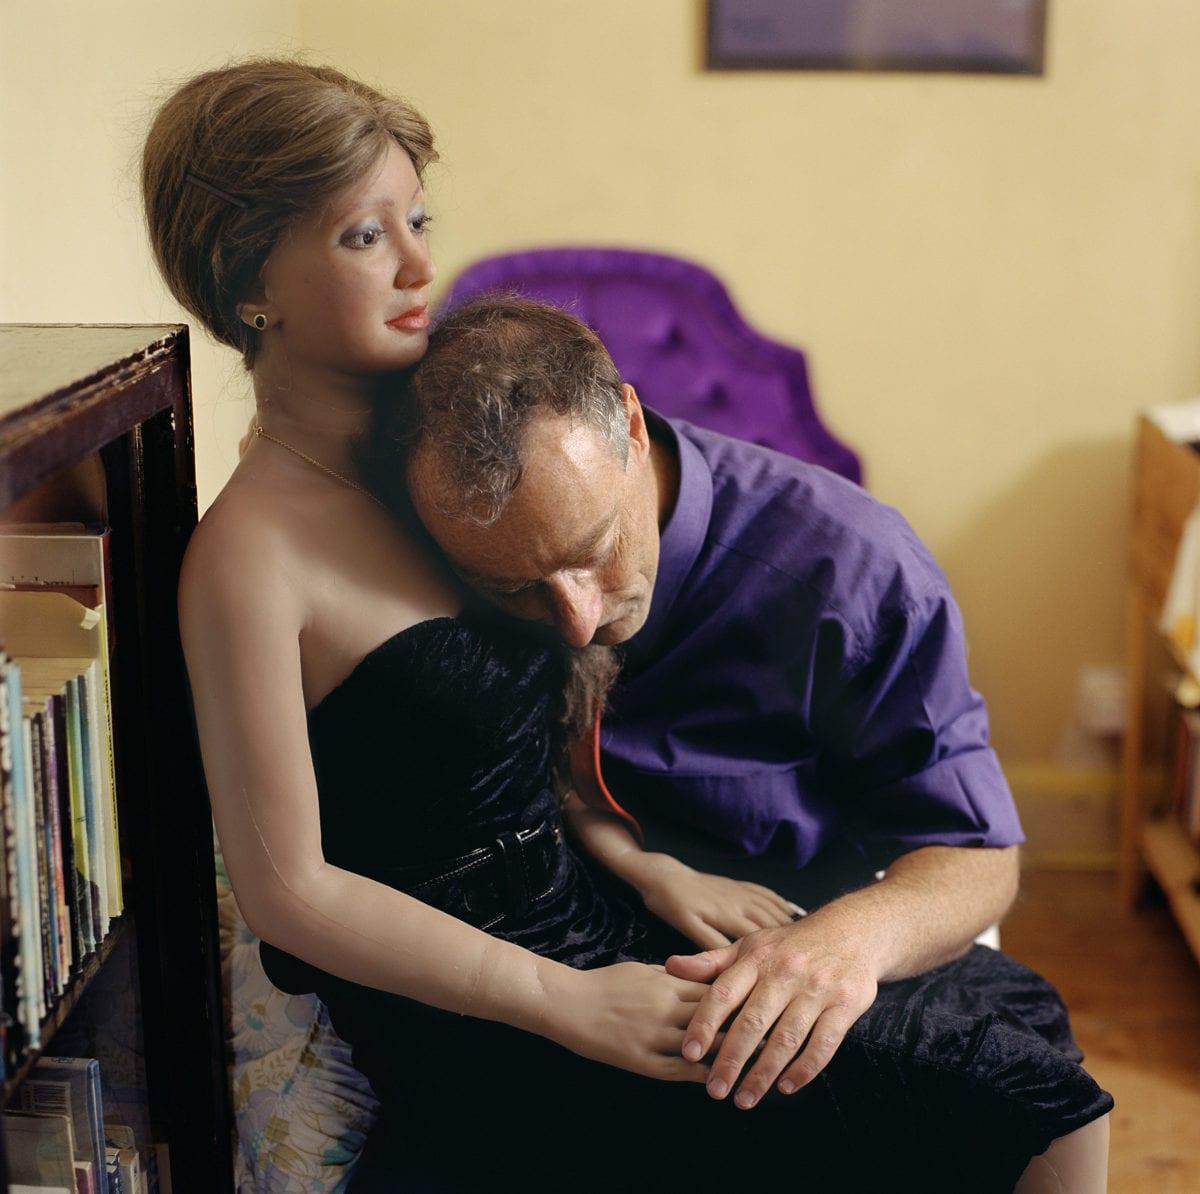 Rebecca 1, 2001, from the series, Still Lovers, Elena Dorfman